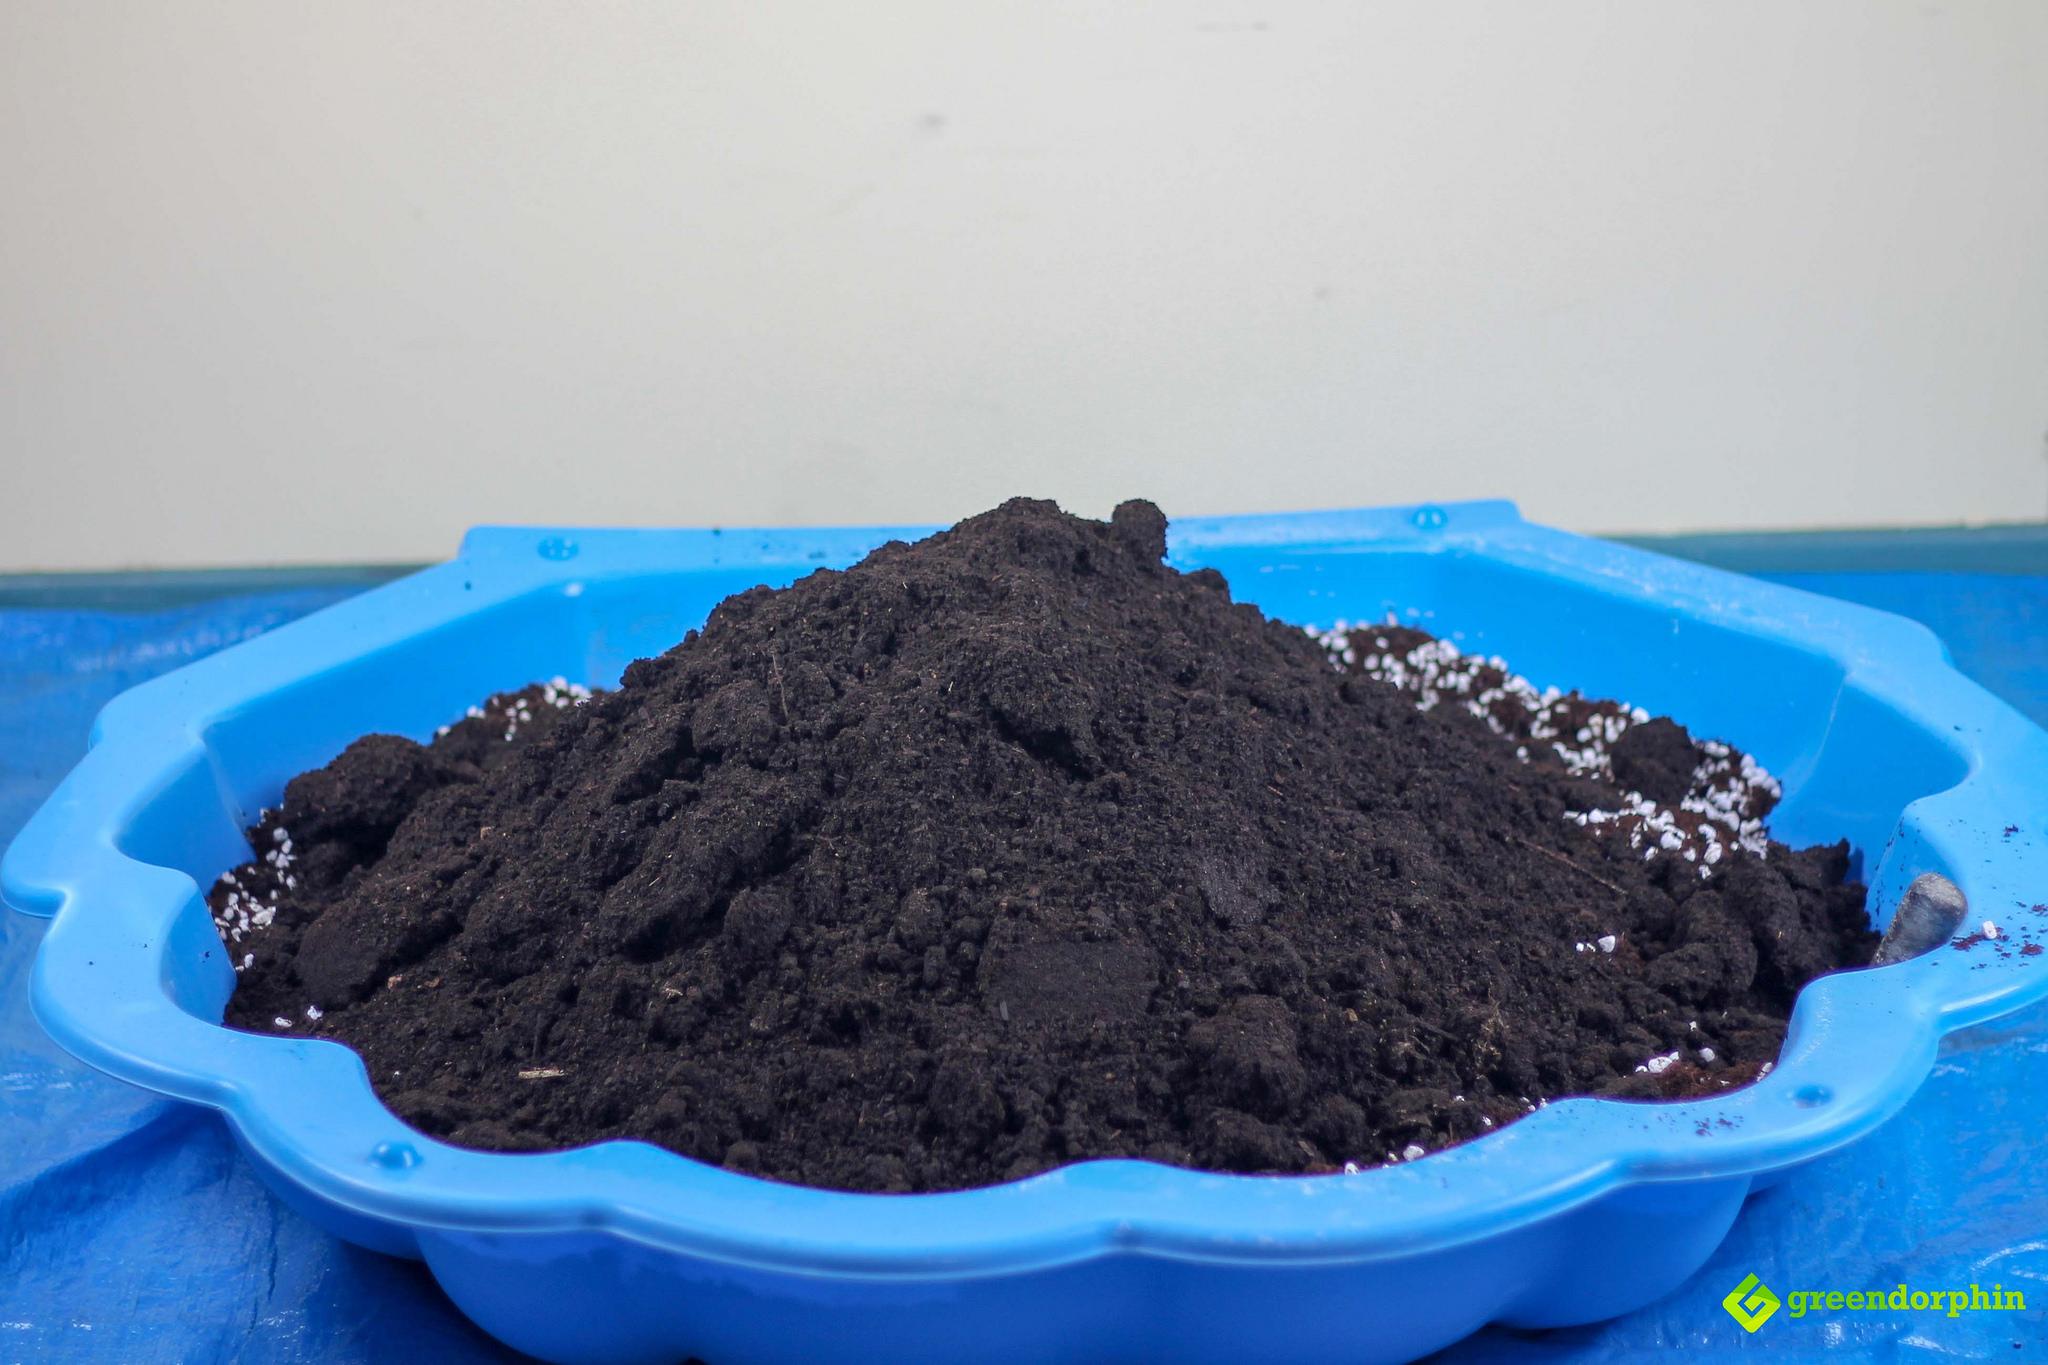 No-Till Soil vermicompost